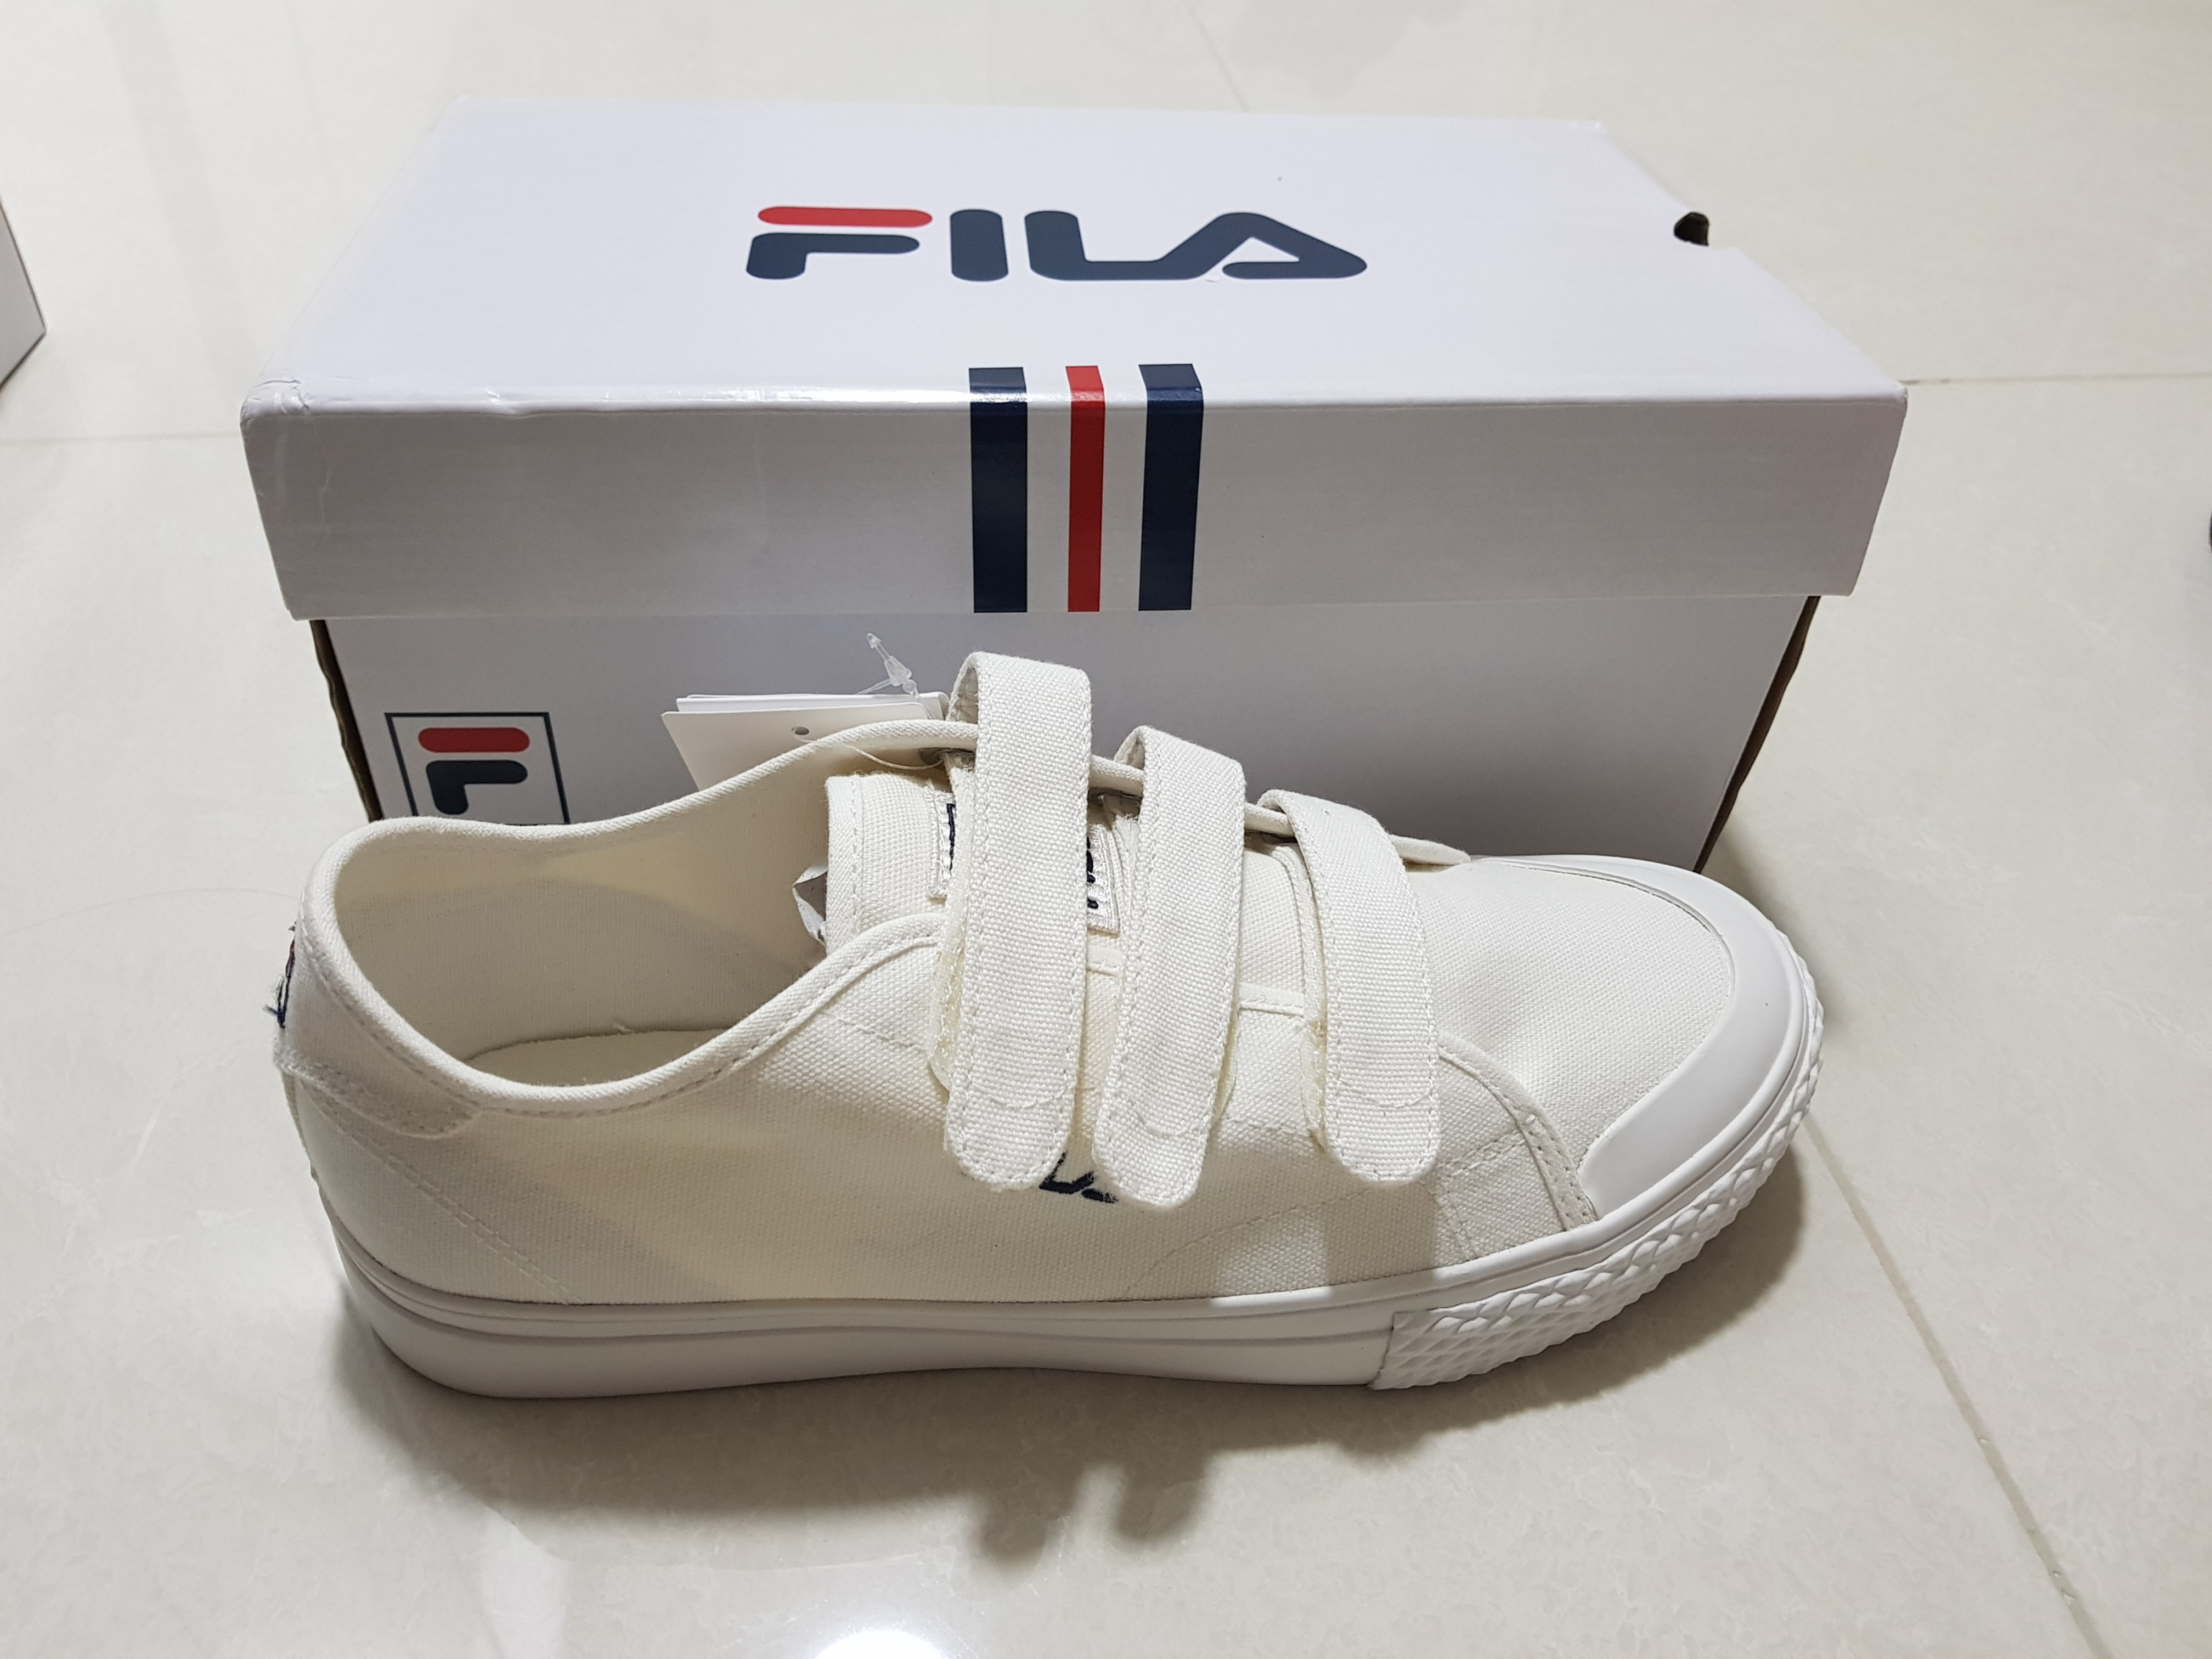 0350e266af Authentic fila kicks velcro off white womens fashion shoes sneakers on  carousell jpg 4032x3024 Fila kicks